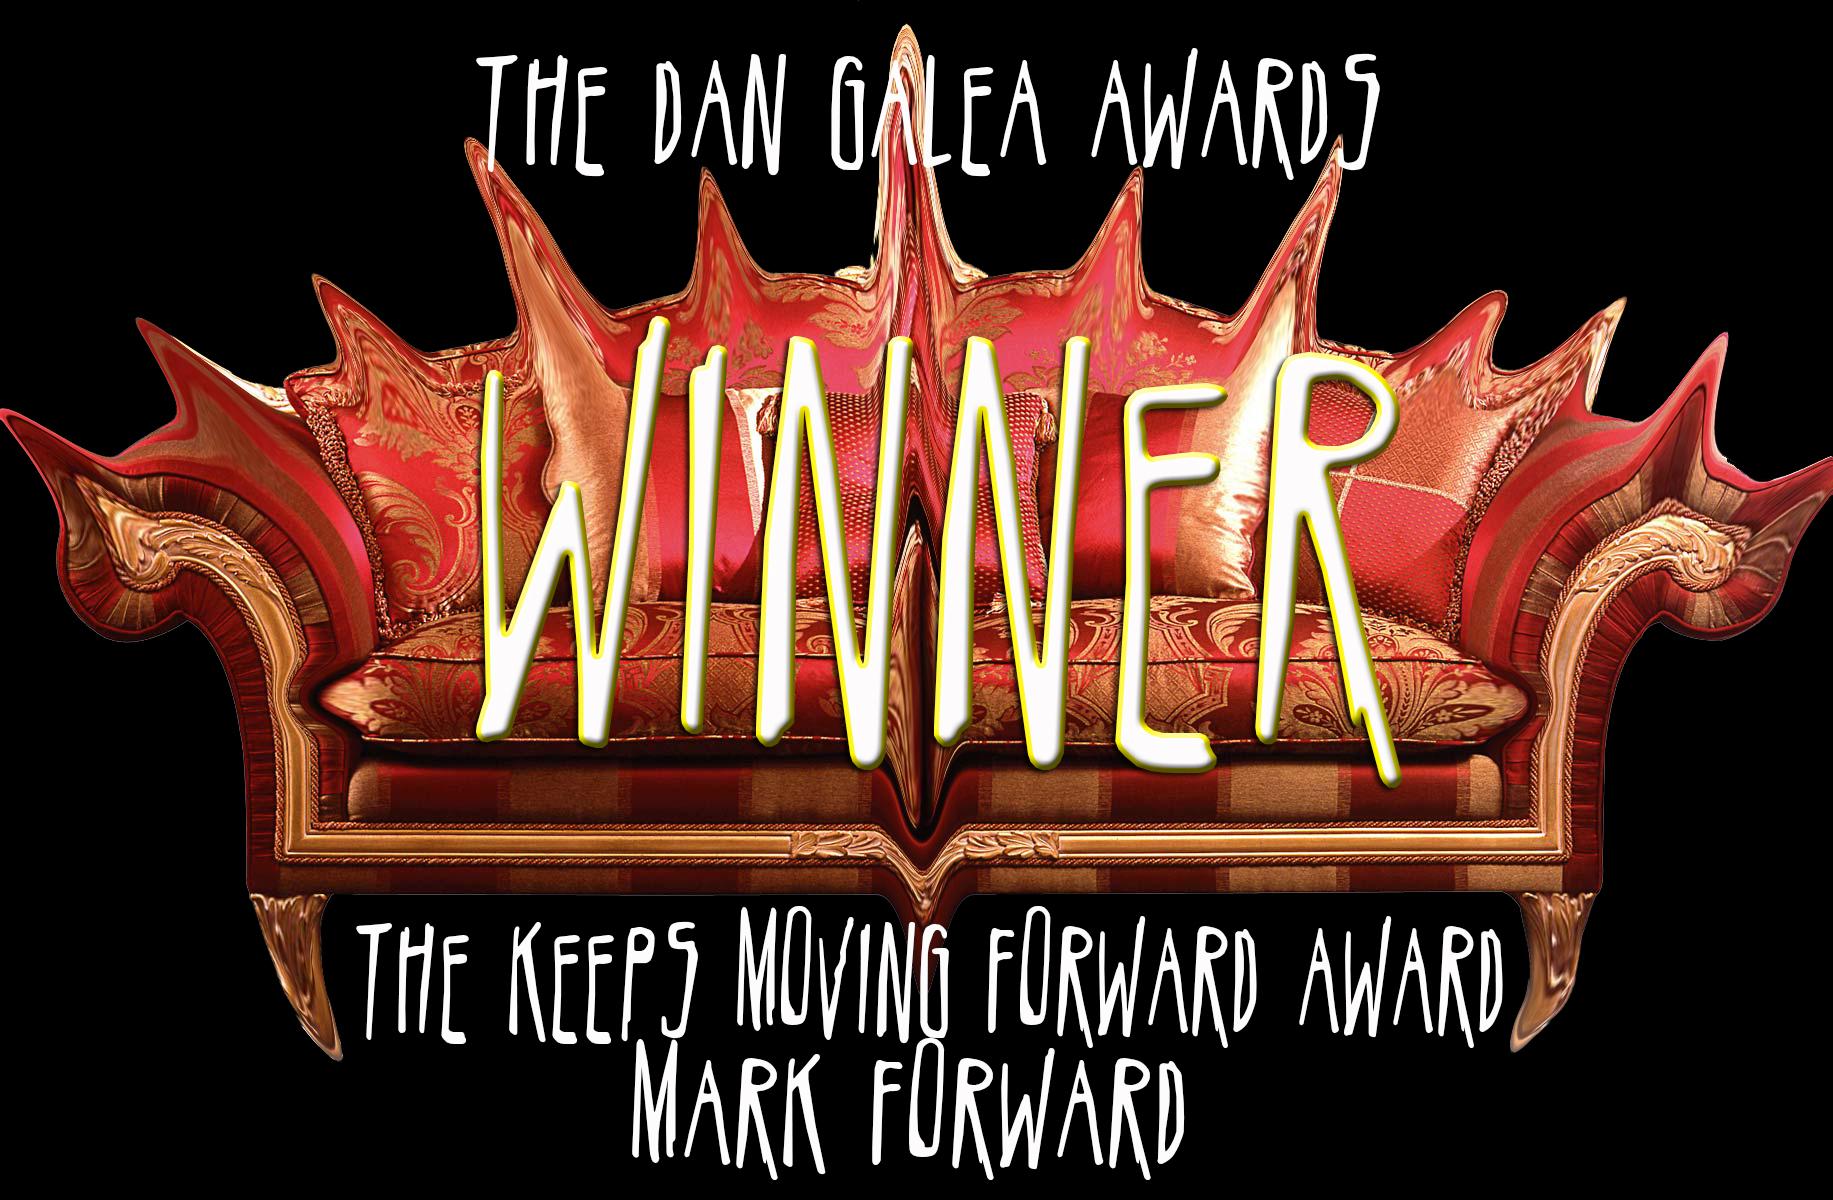 DGAWARDS Mark Forward.jpg